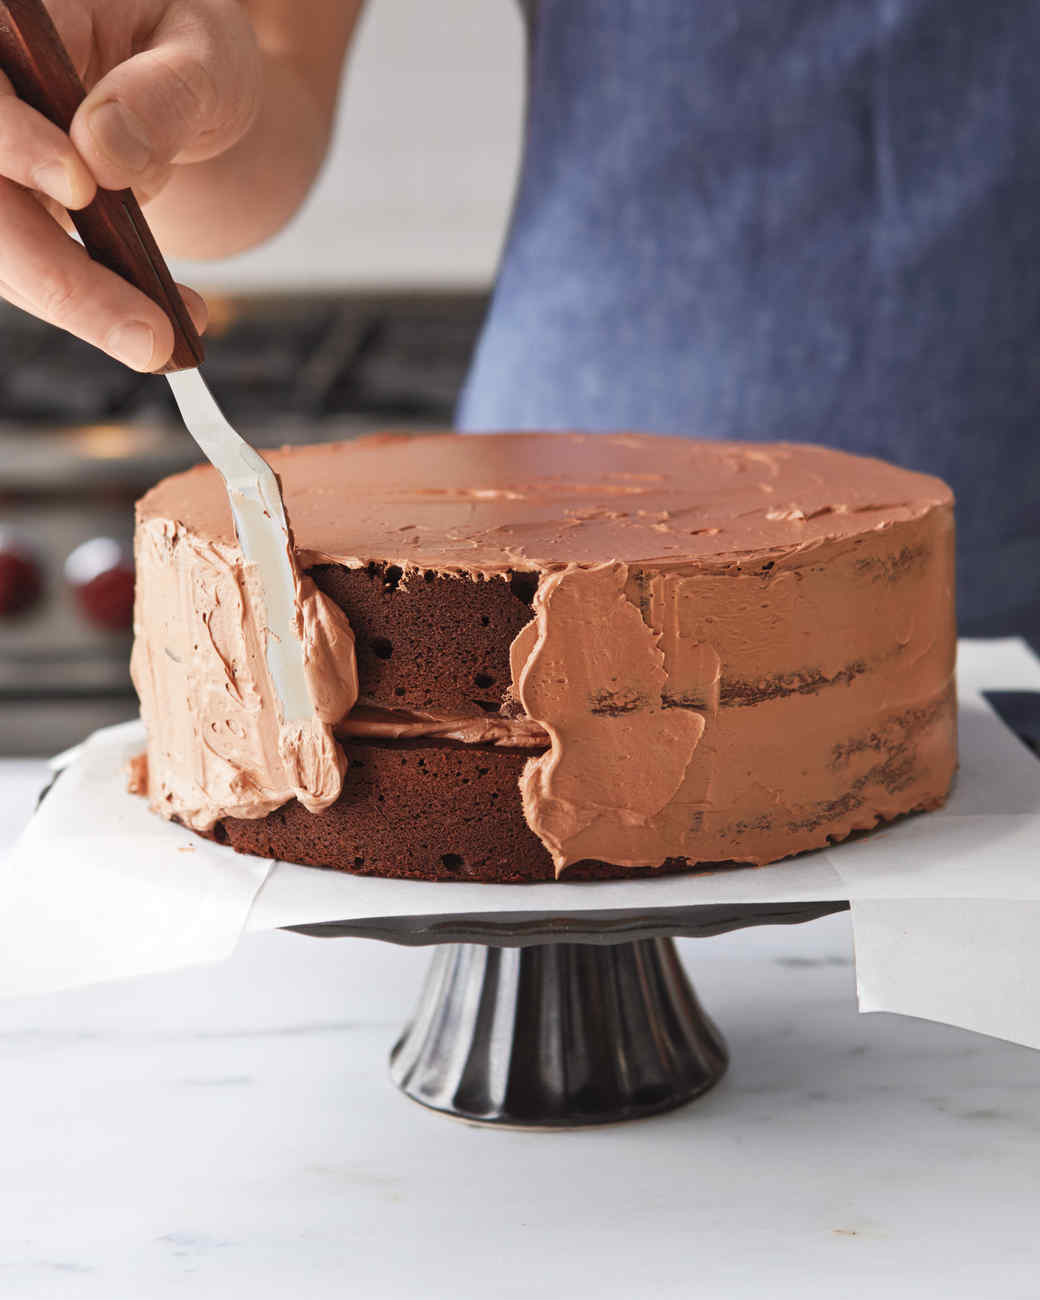 devils-food-cake-process-311-d112204.jpg